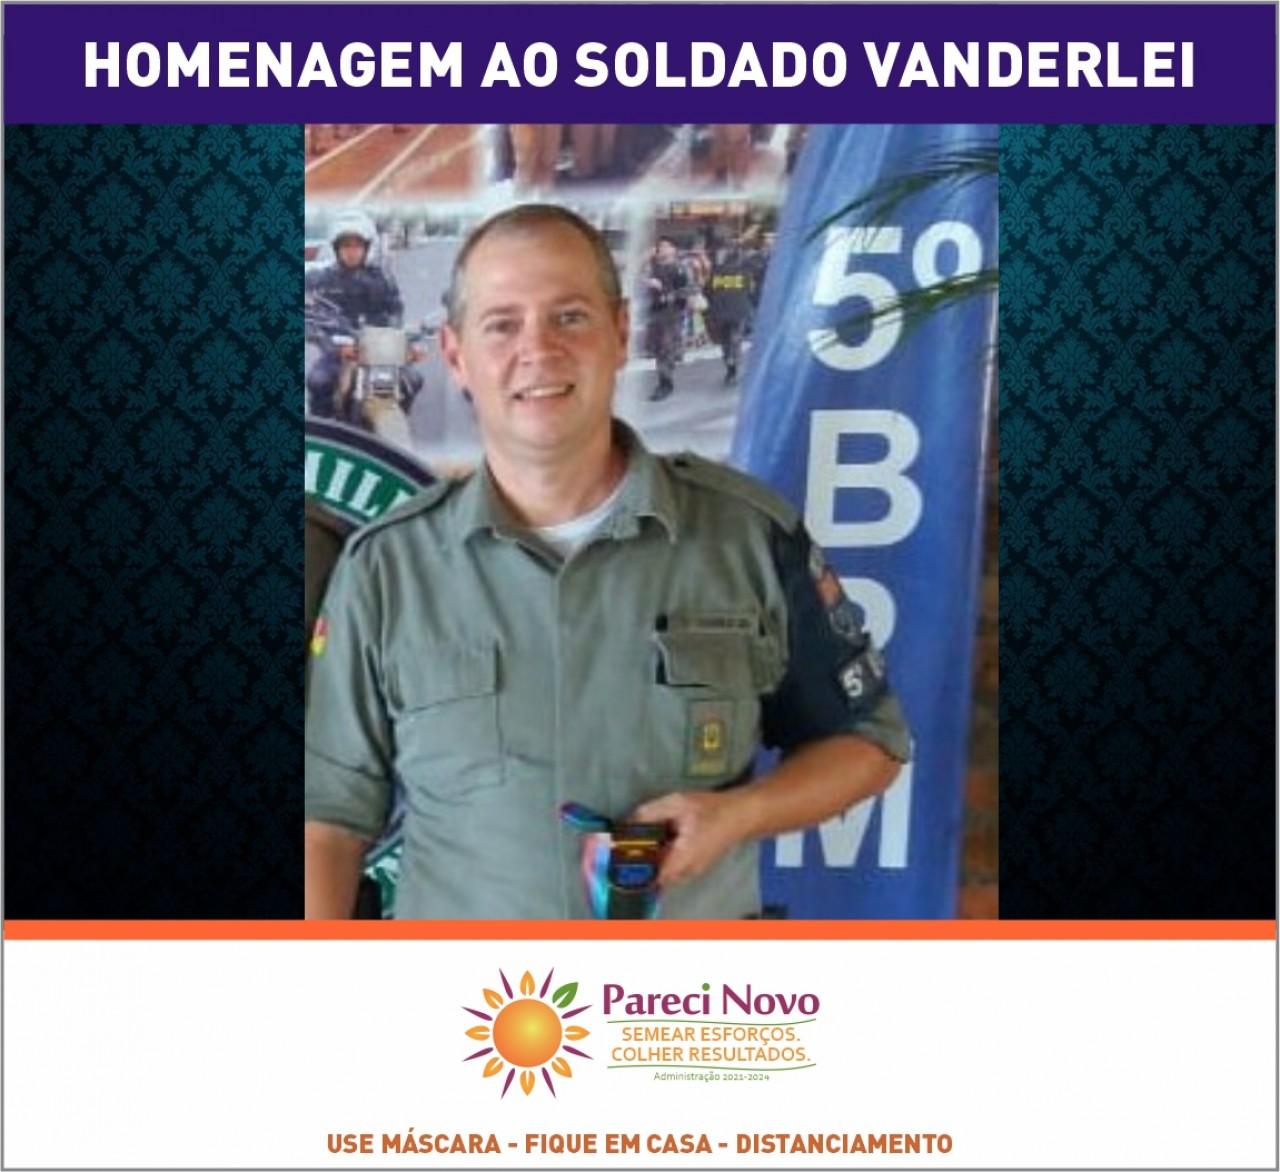 Homenagem ao Soldado Vanderlei